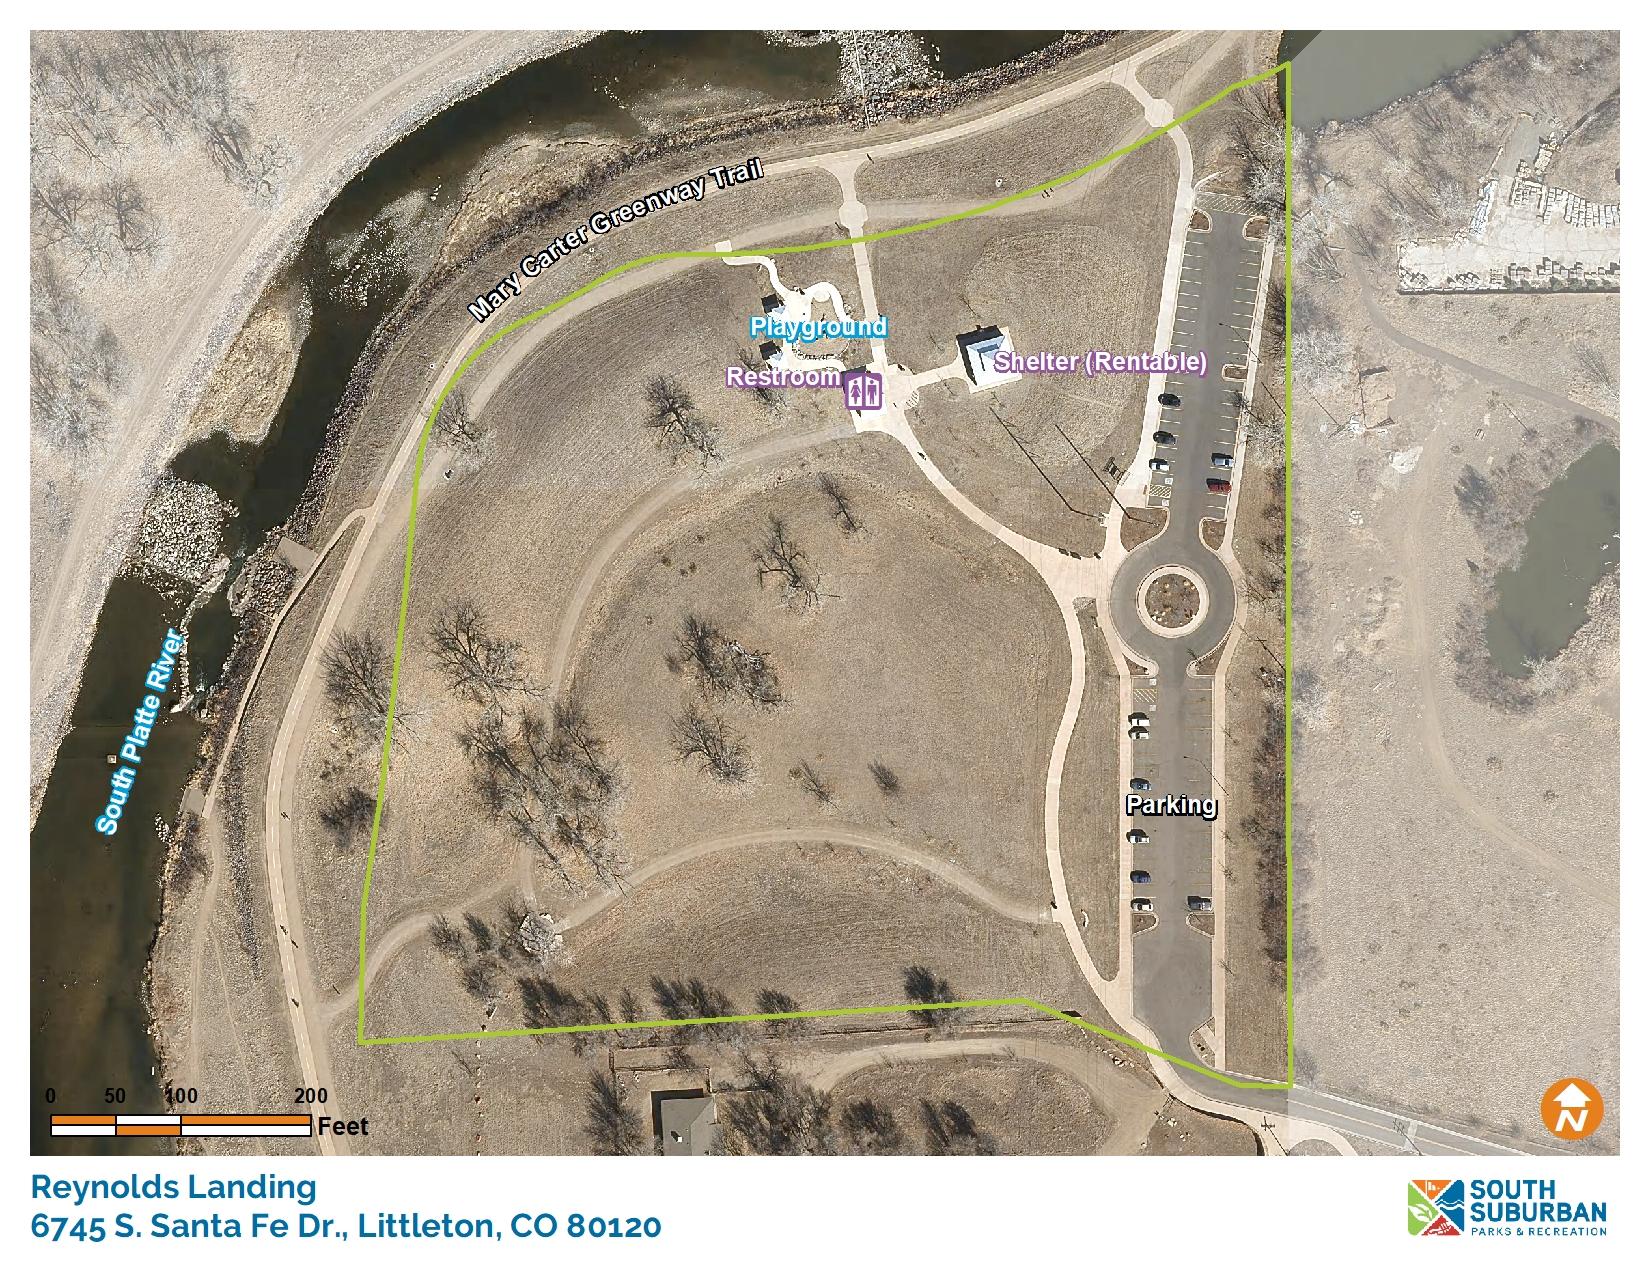 Platte River Location Reynolds Landing - Sou...